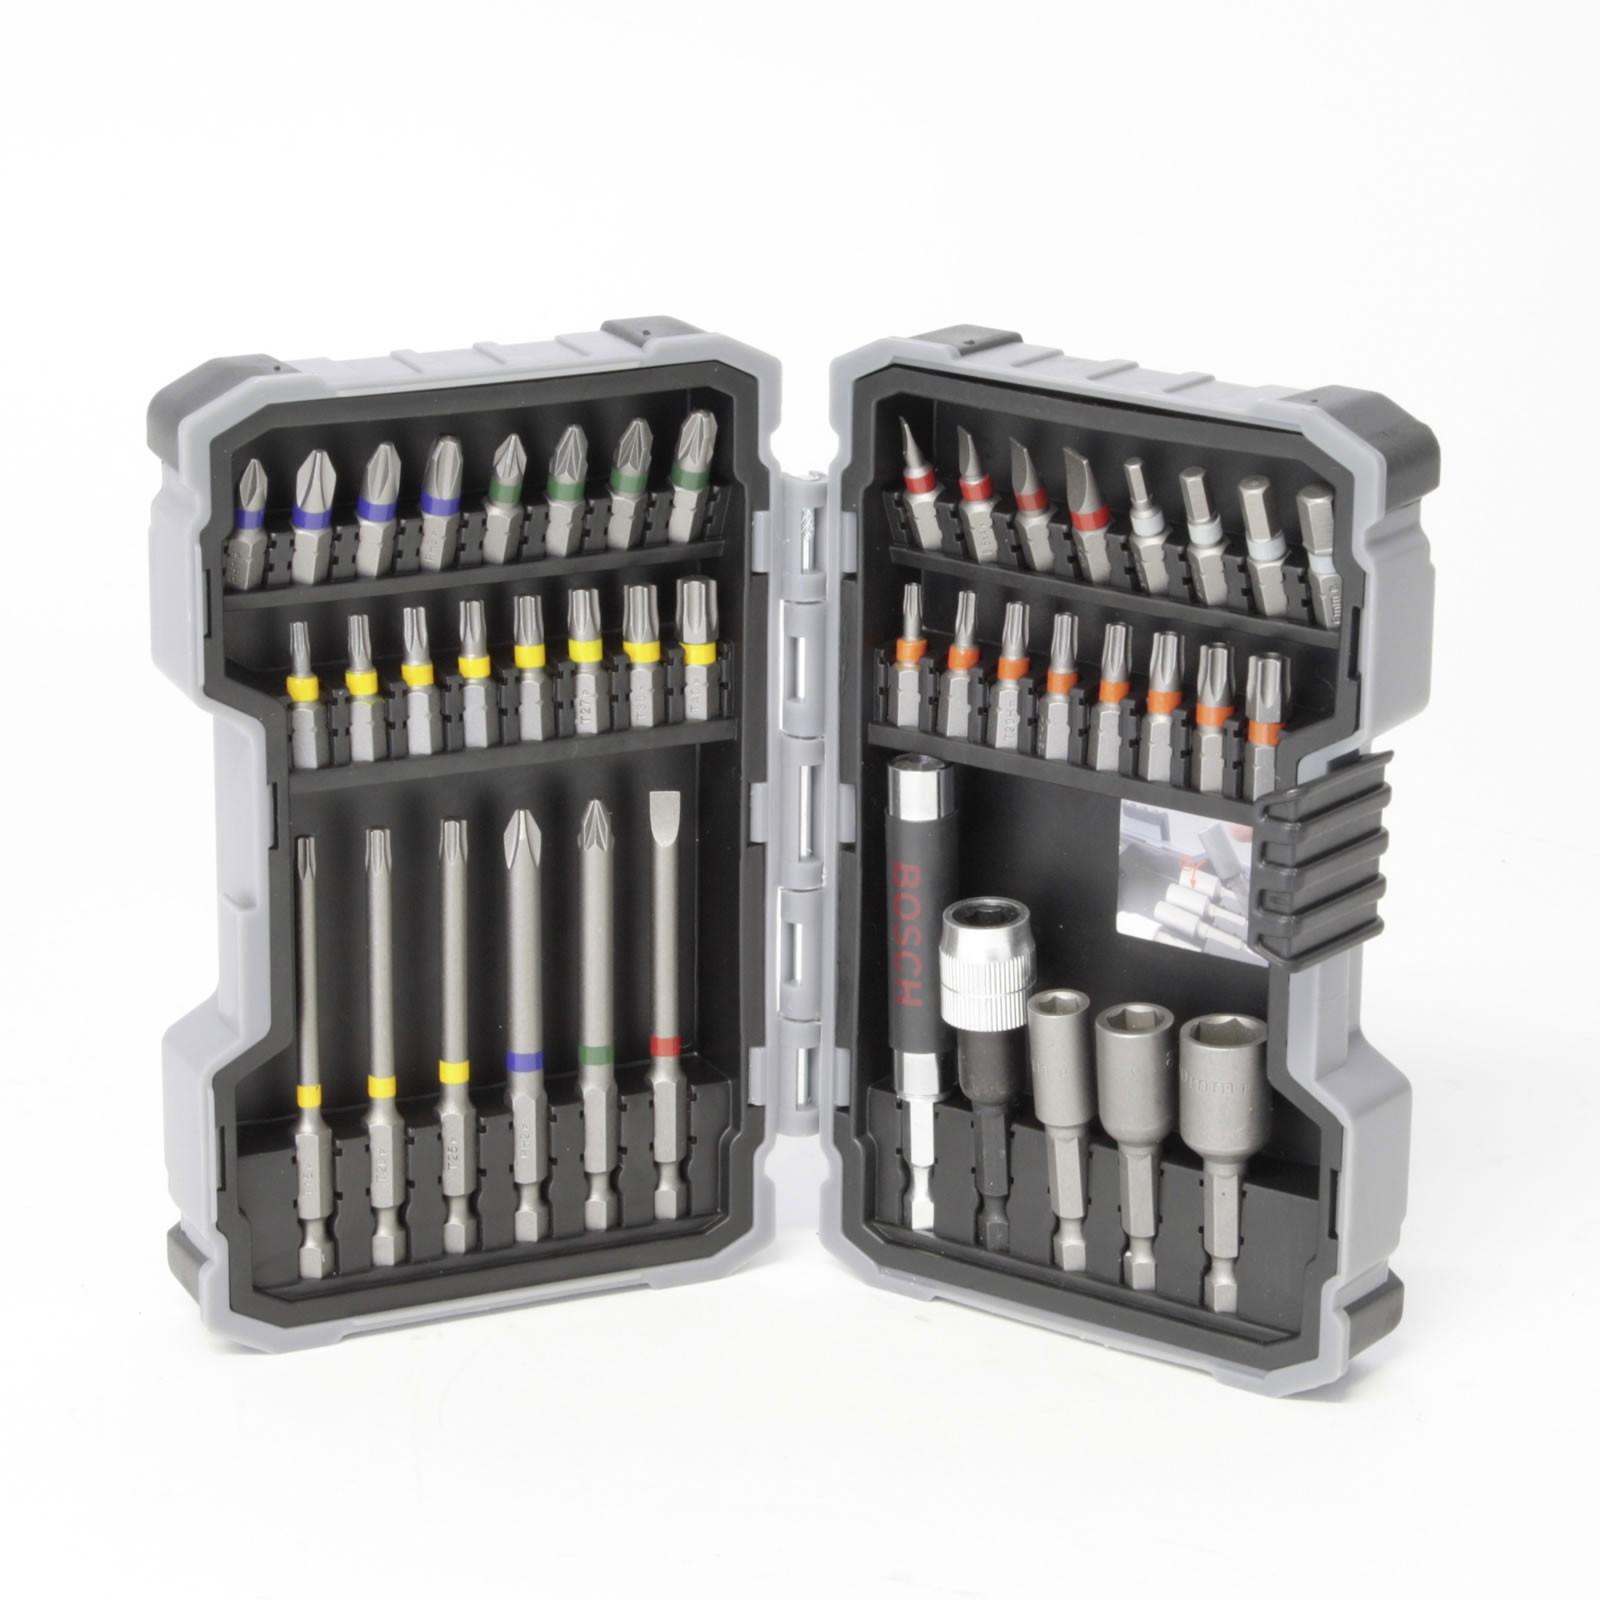 Bosch Akkuschrauber Bit-Set 43-teilig 12003